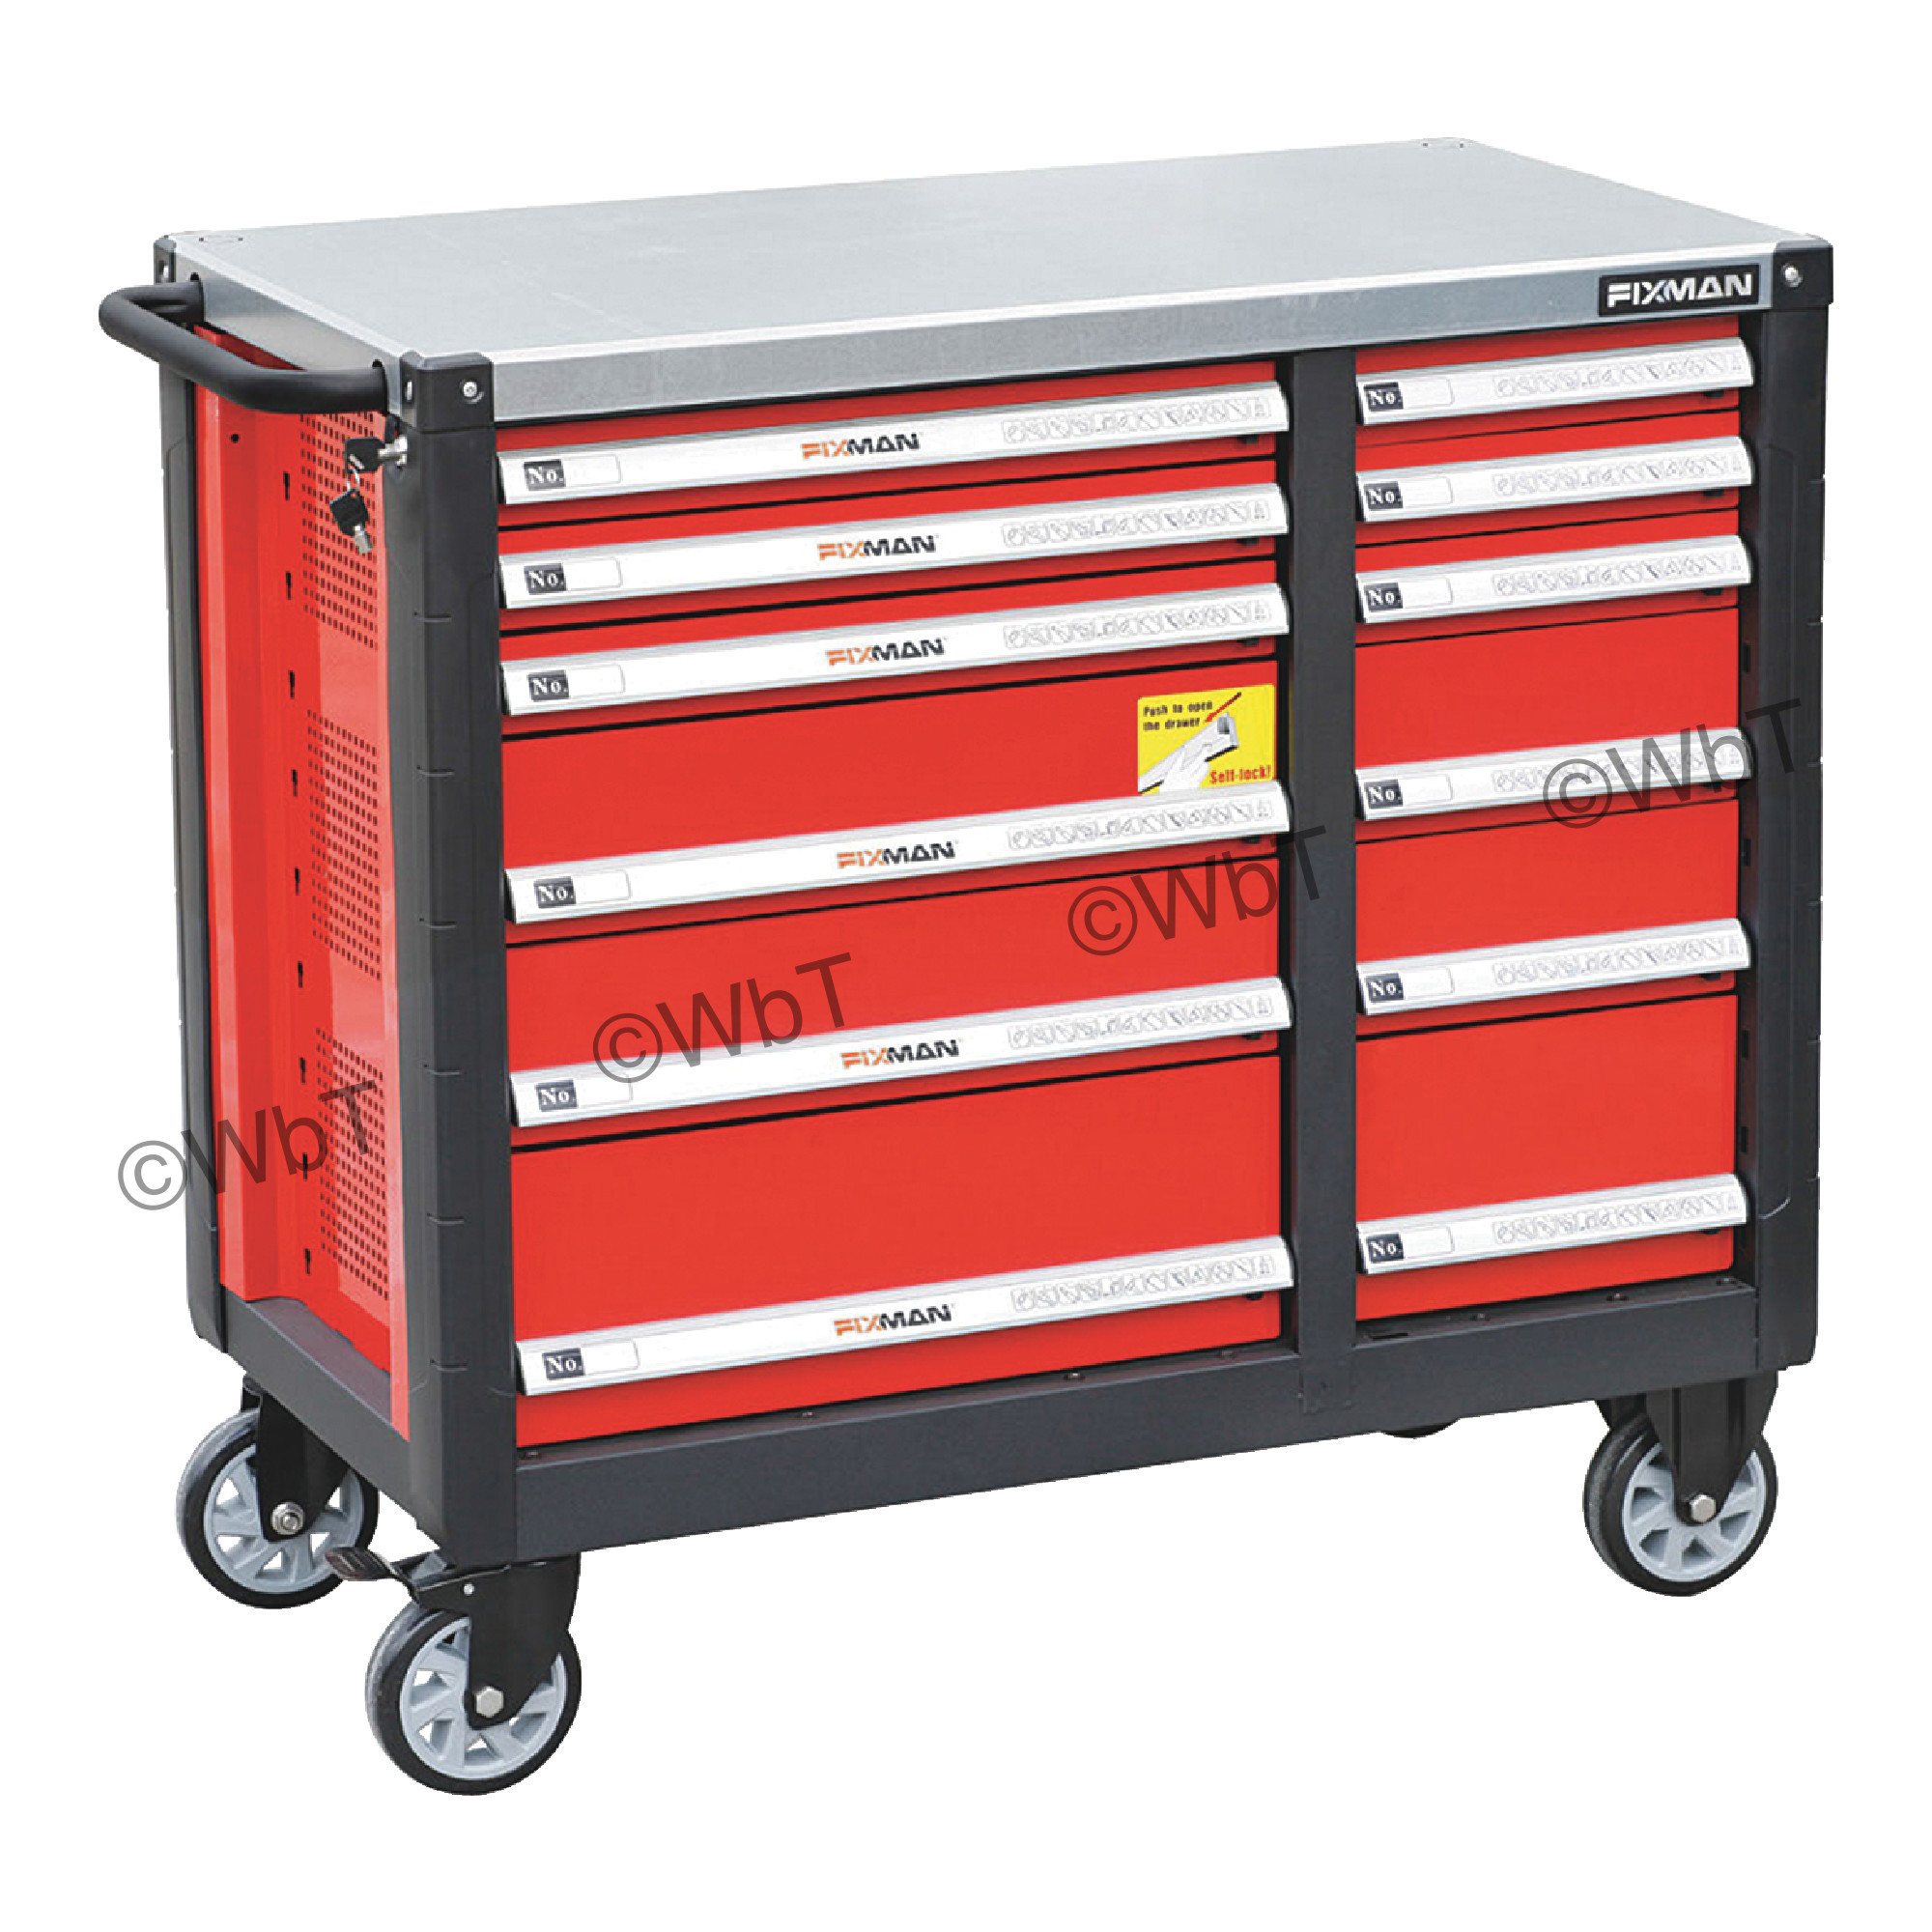 12 Drawer Mobile Workbench